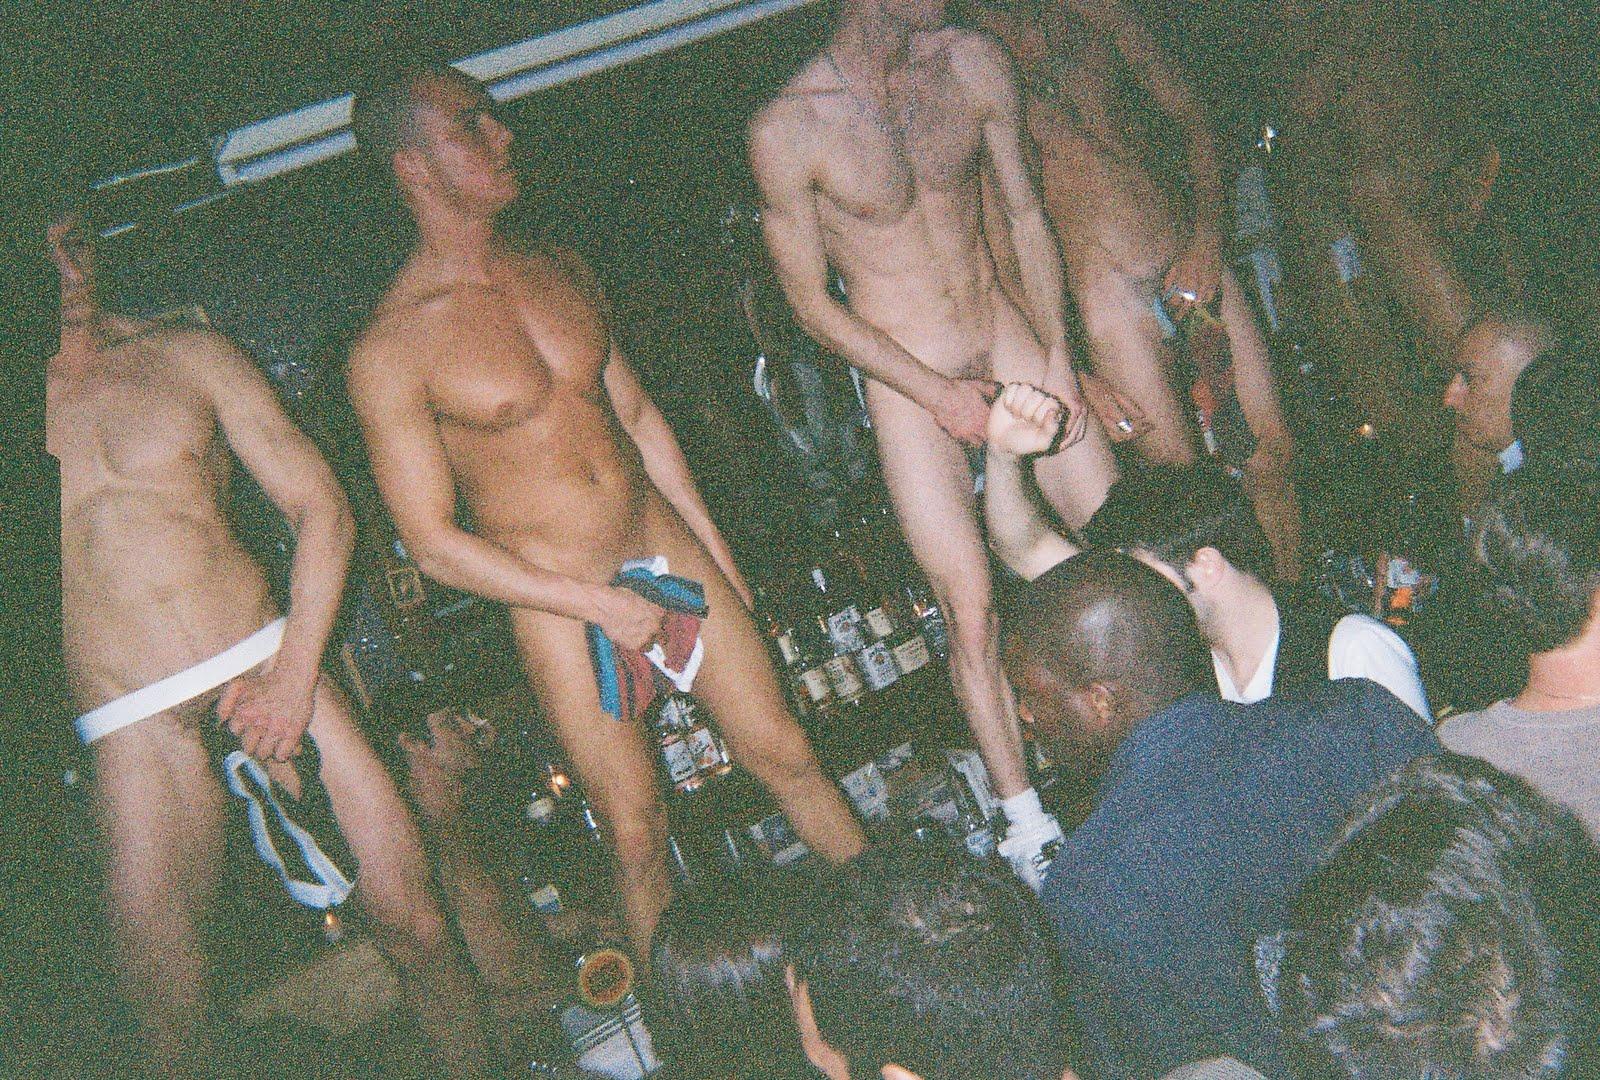 naked boys gone wild